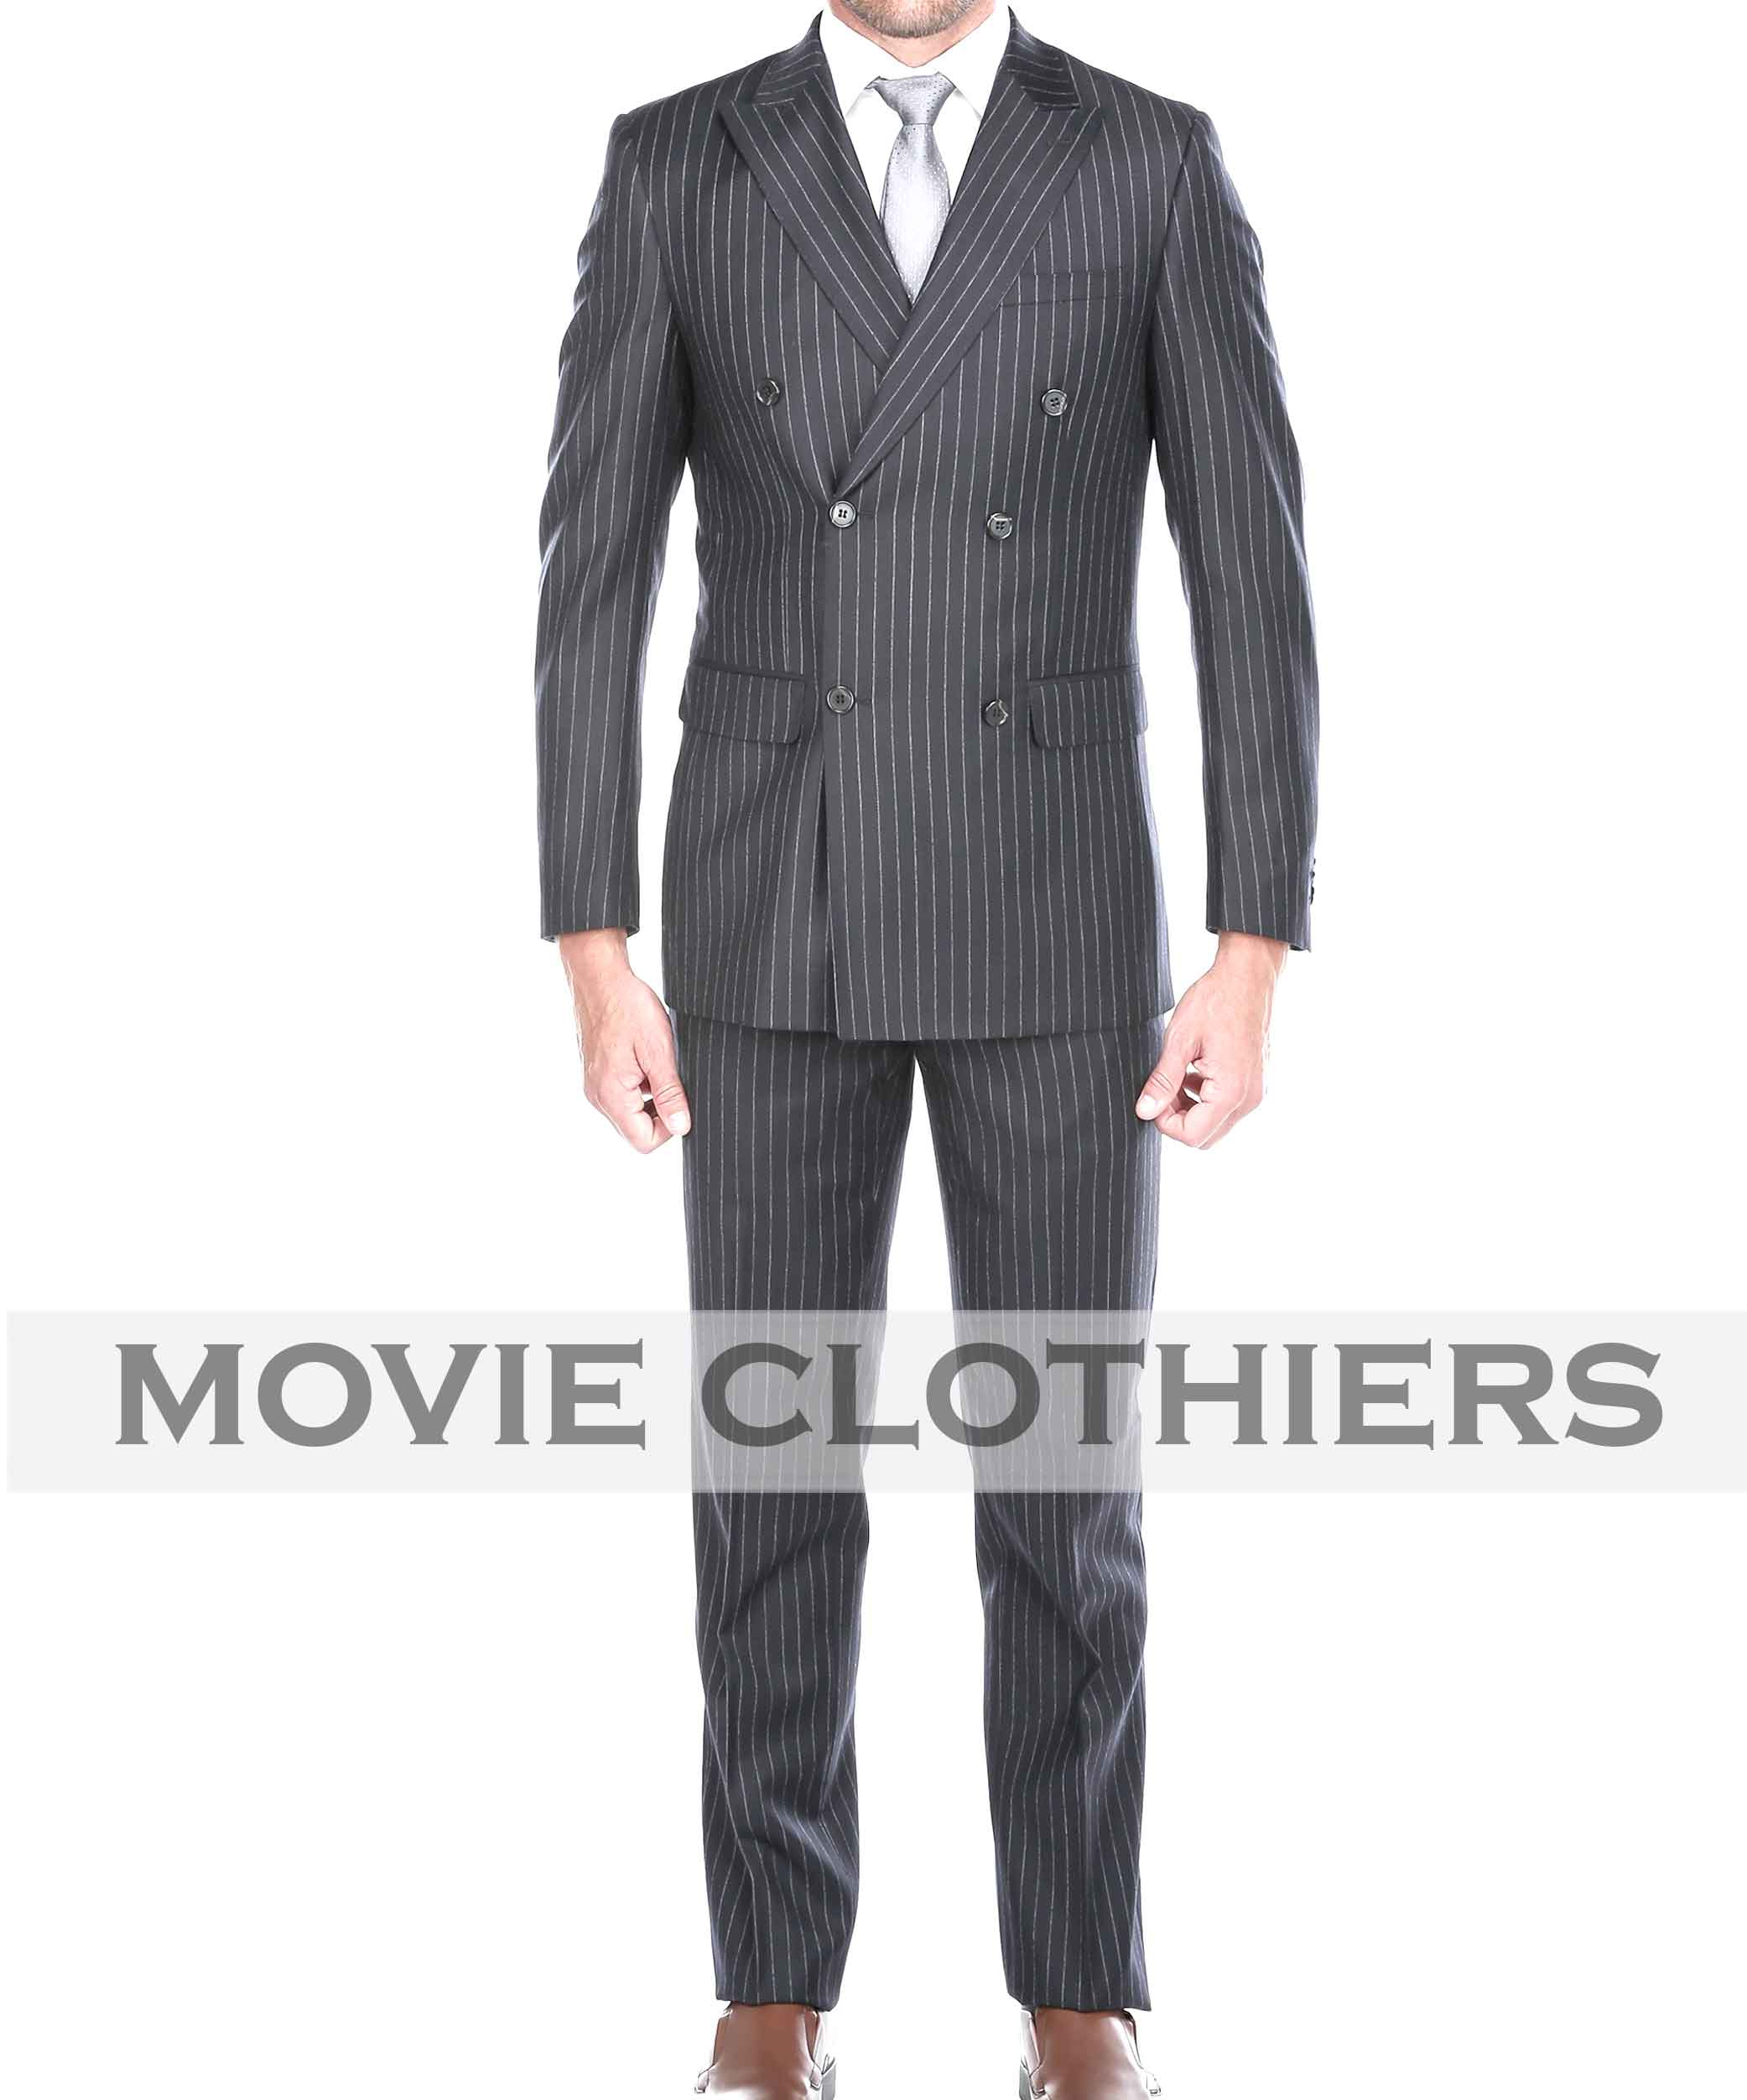 kingsman 2 clothing pinstripe Agent Tequila suit